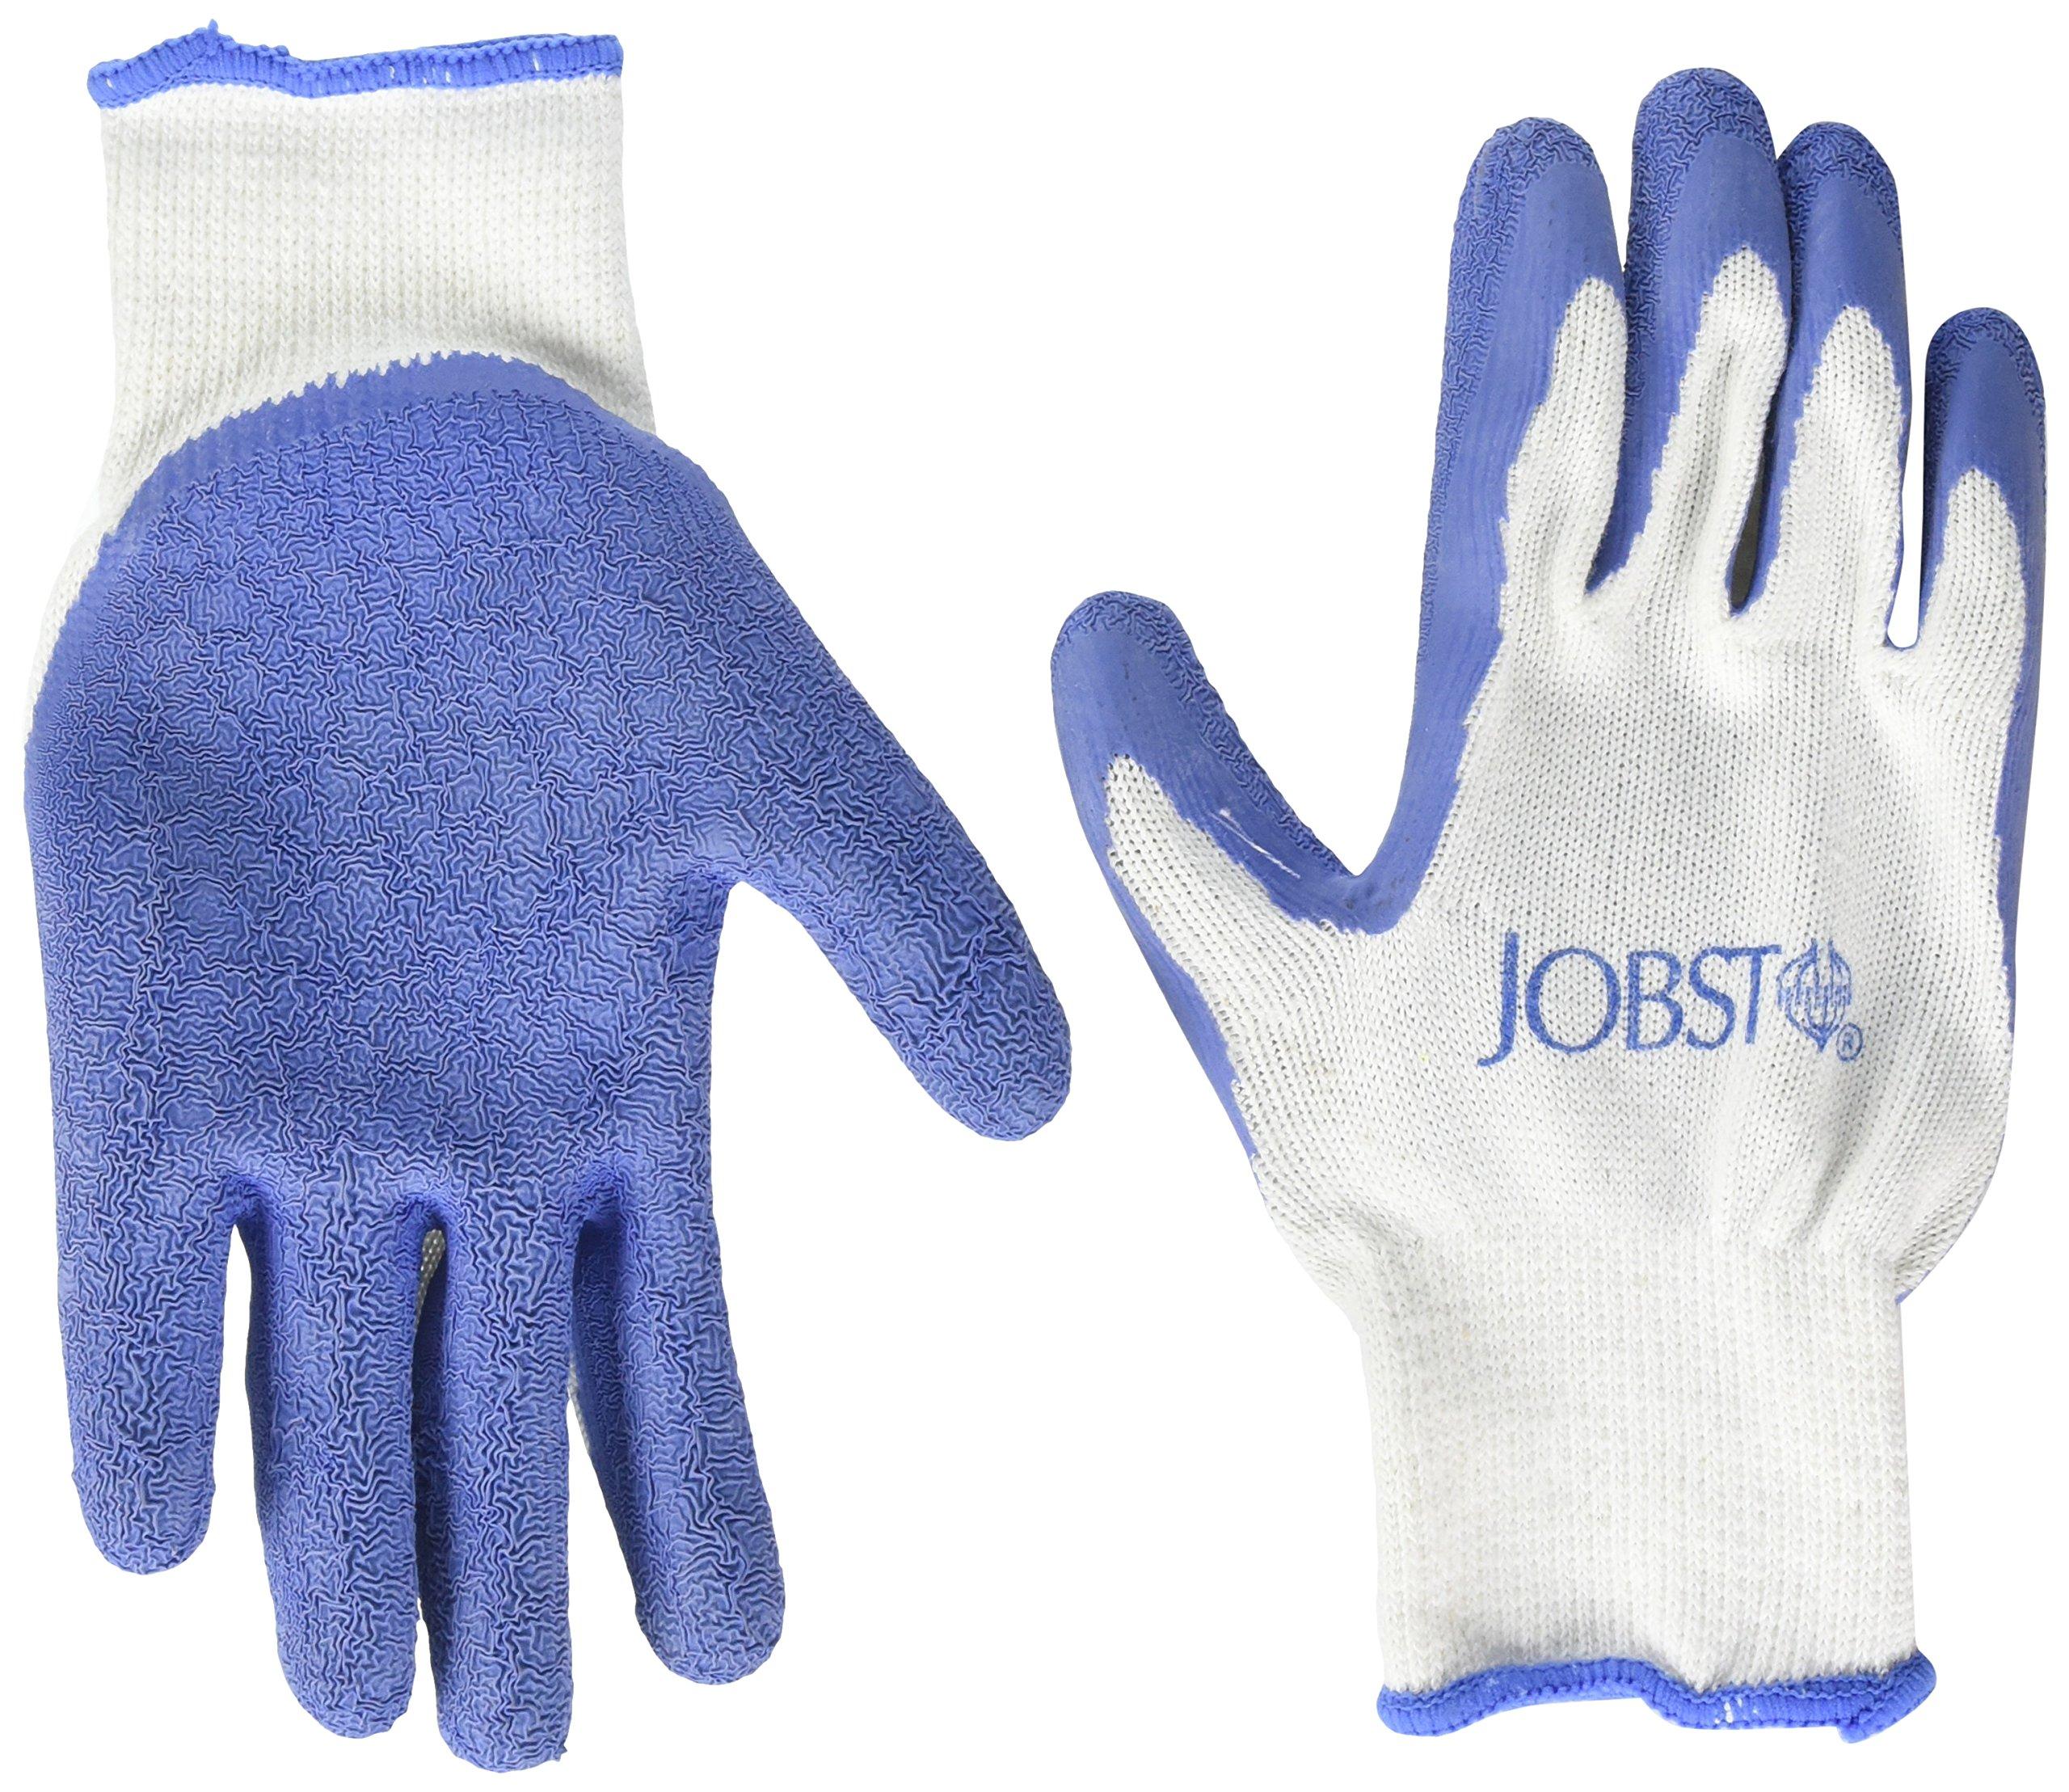 Complete Medical Donning Gloves Jobst, Medium, 0.2 Pound